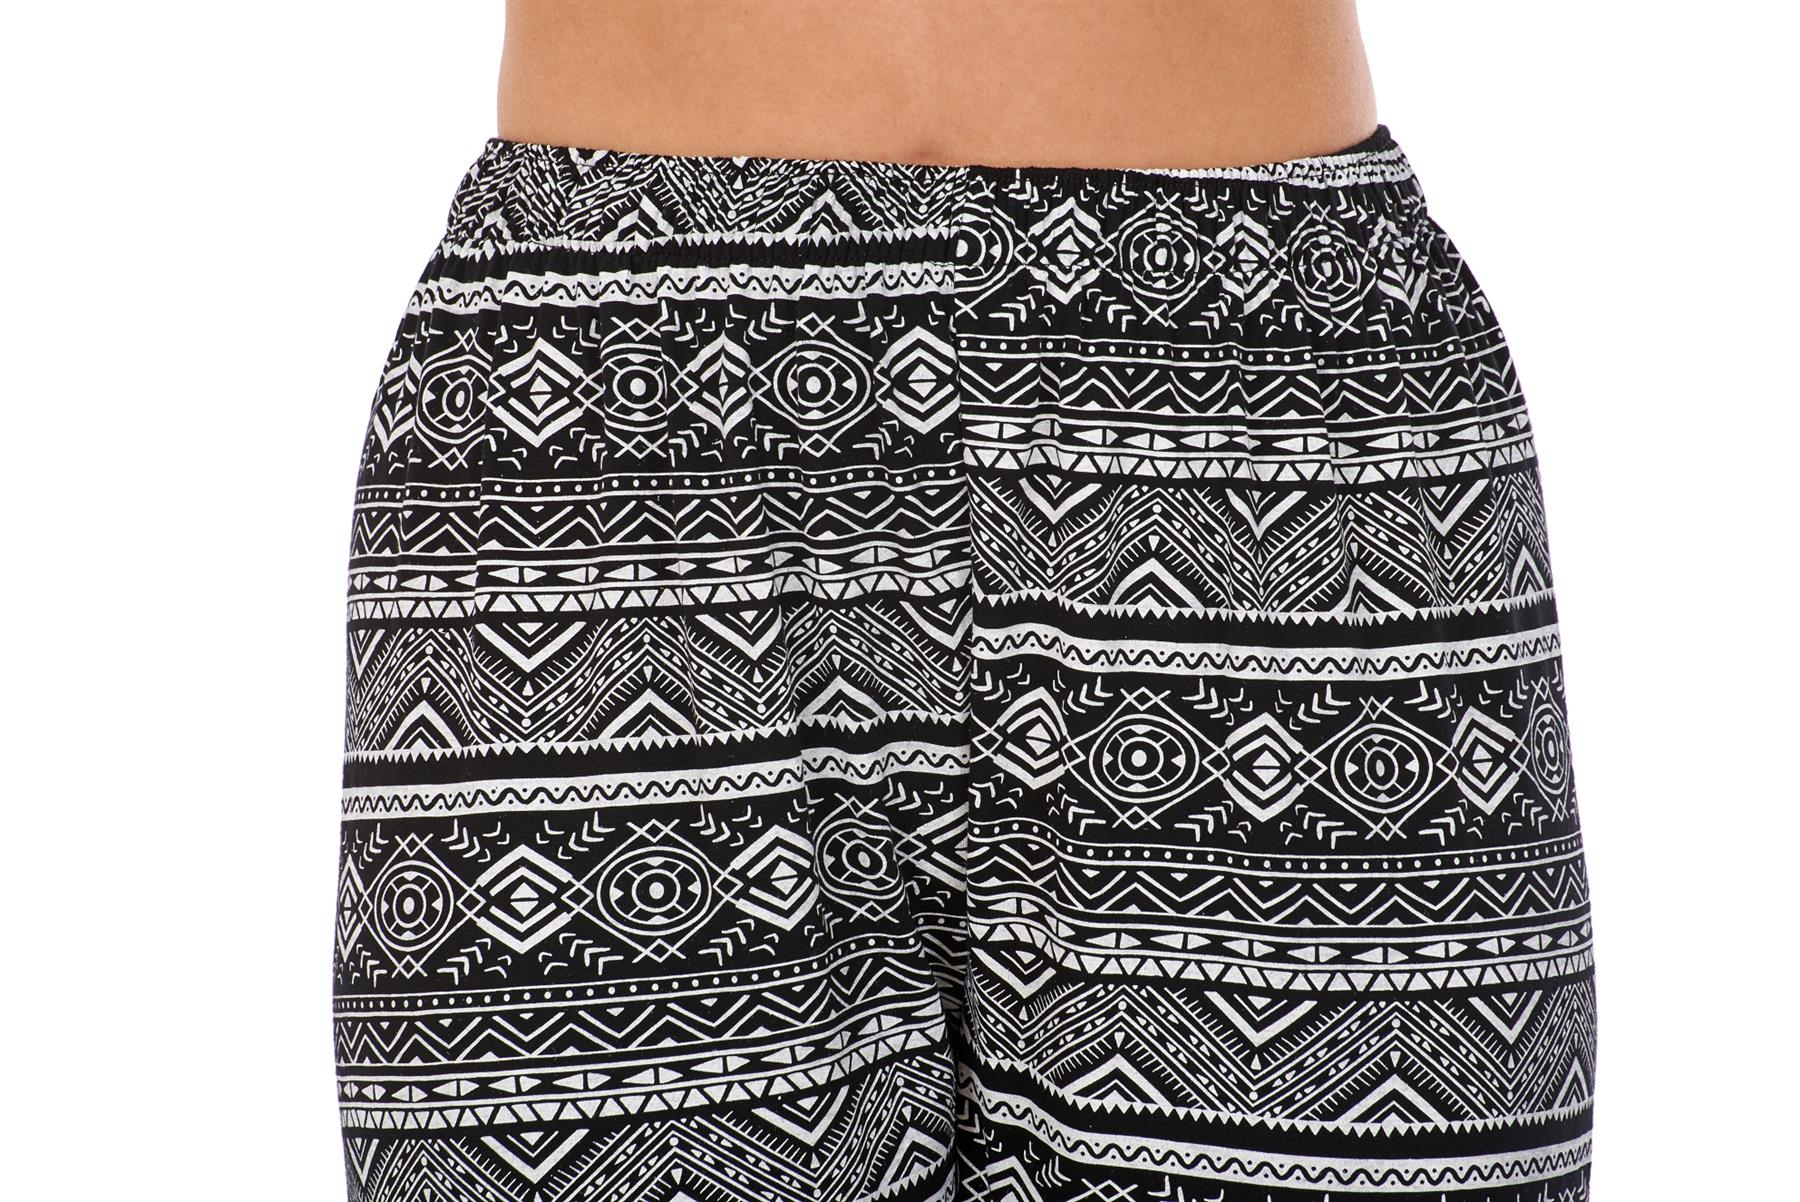 Ladies-Women-Trouser-Elasticated-Printed-Tapered-Harem-High-waist-Regular-Pants thumbnail 17